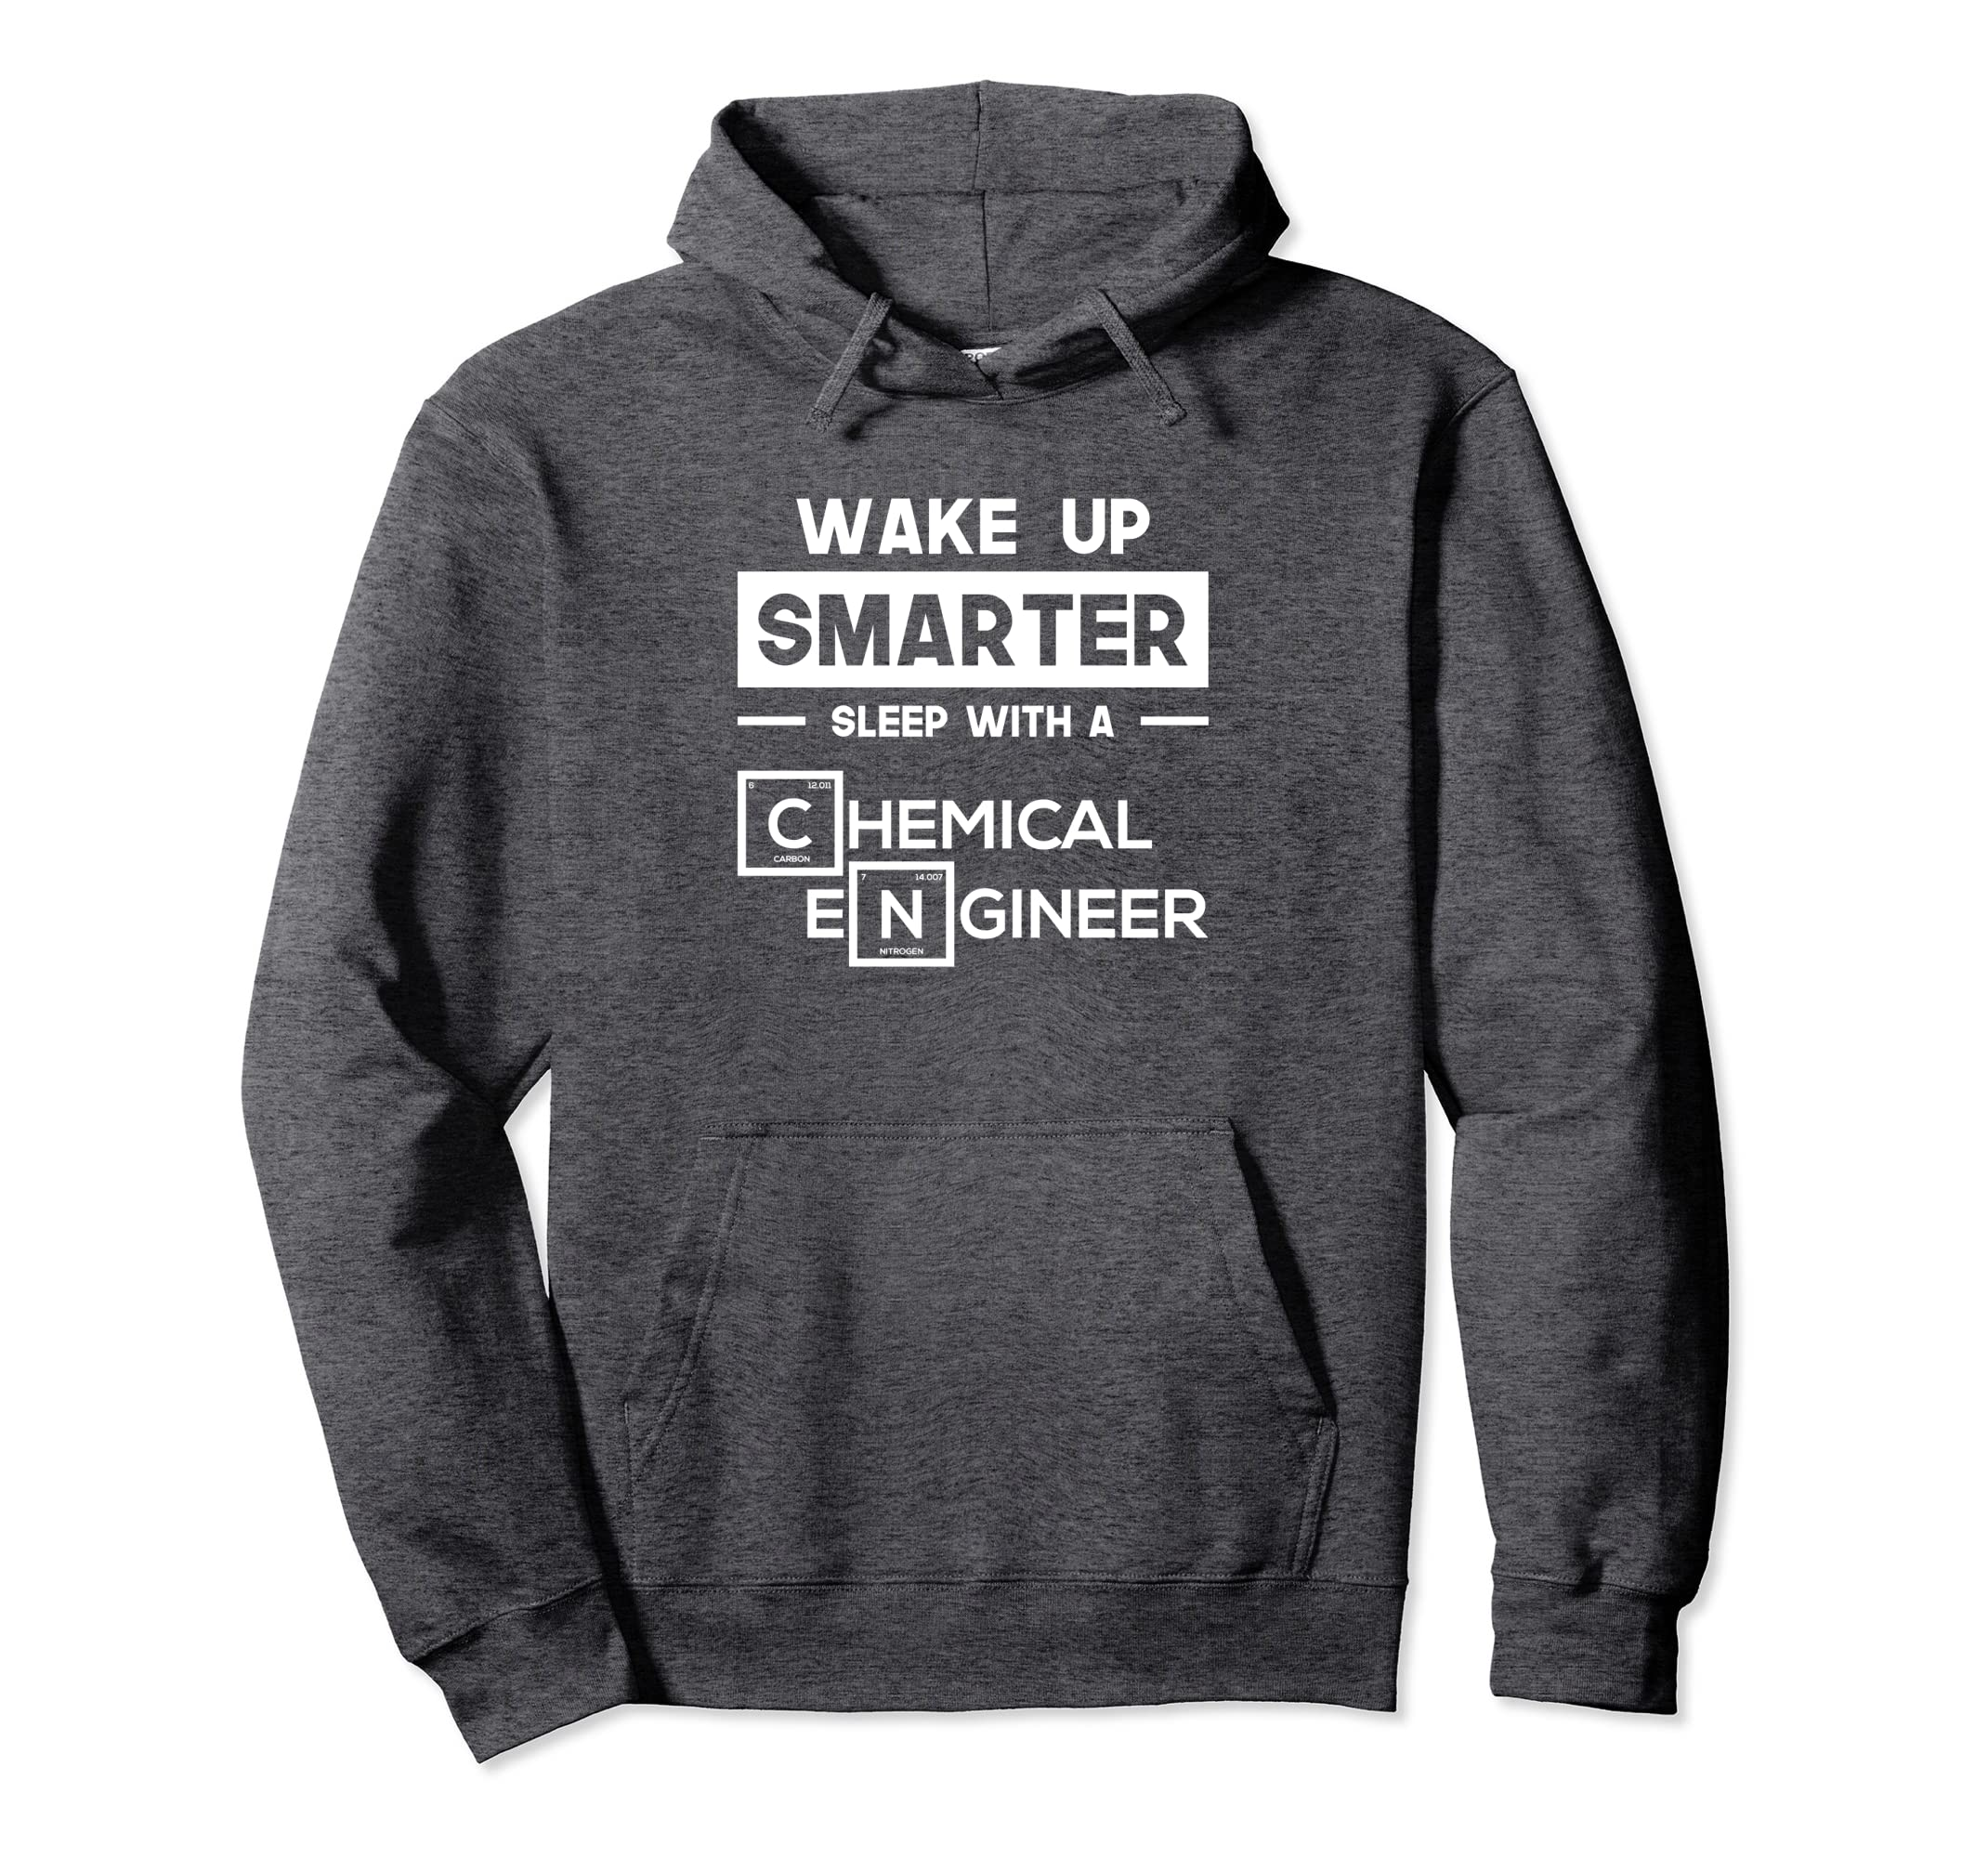 Wake Up Smarter Sleep With A Chemical Engineer Hoodie Gifts